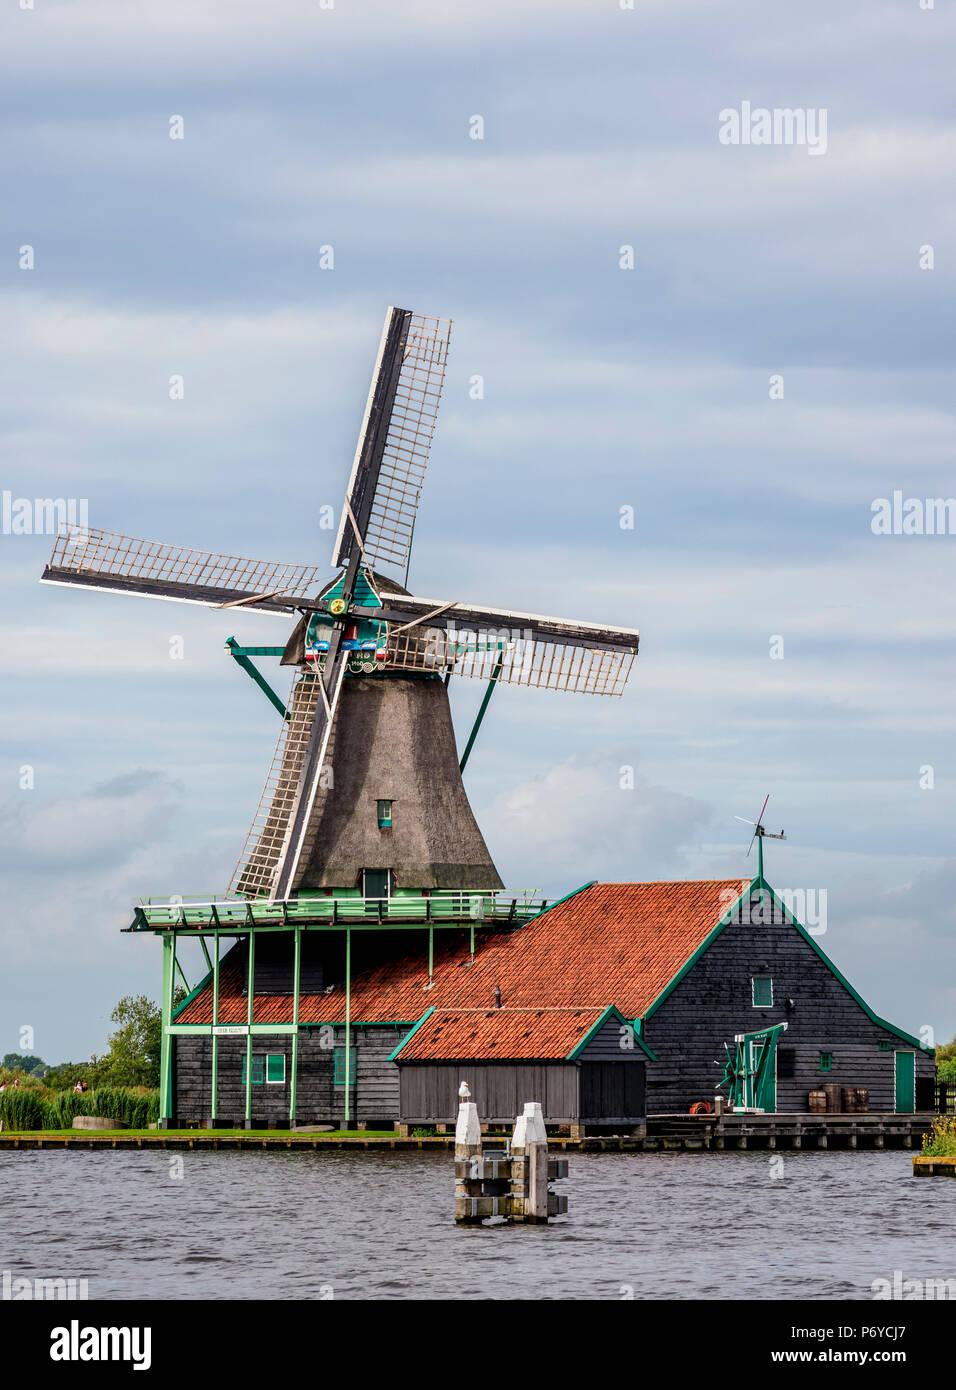 Windmill in Zaanse Schans, Zaandam, North Holland, The Netherlands - Stock Image